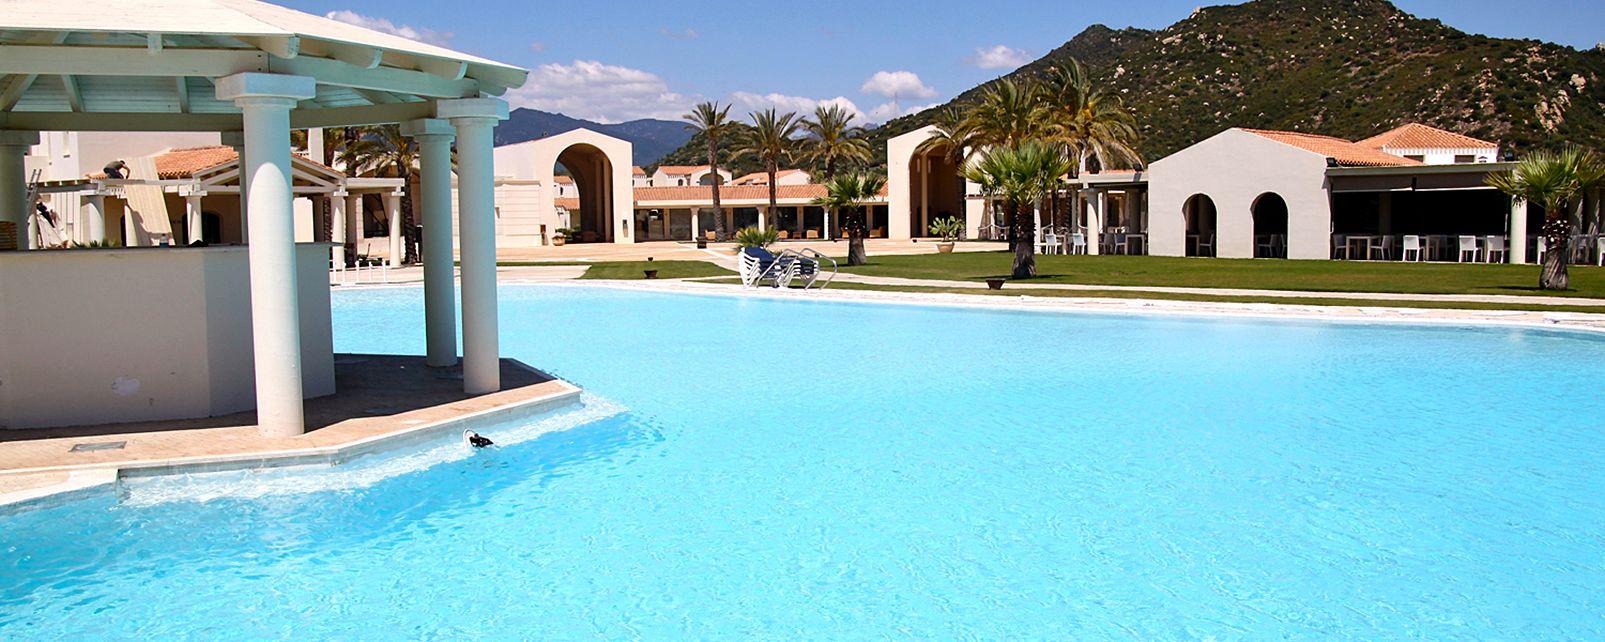 Hotel Spiagge San Pietro